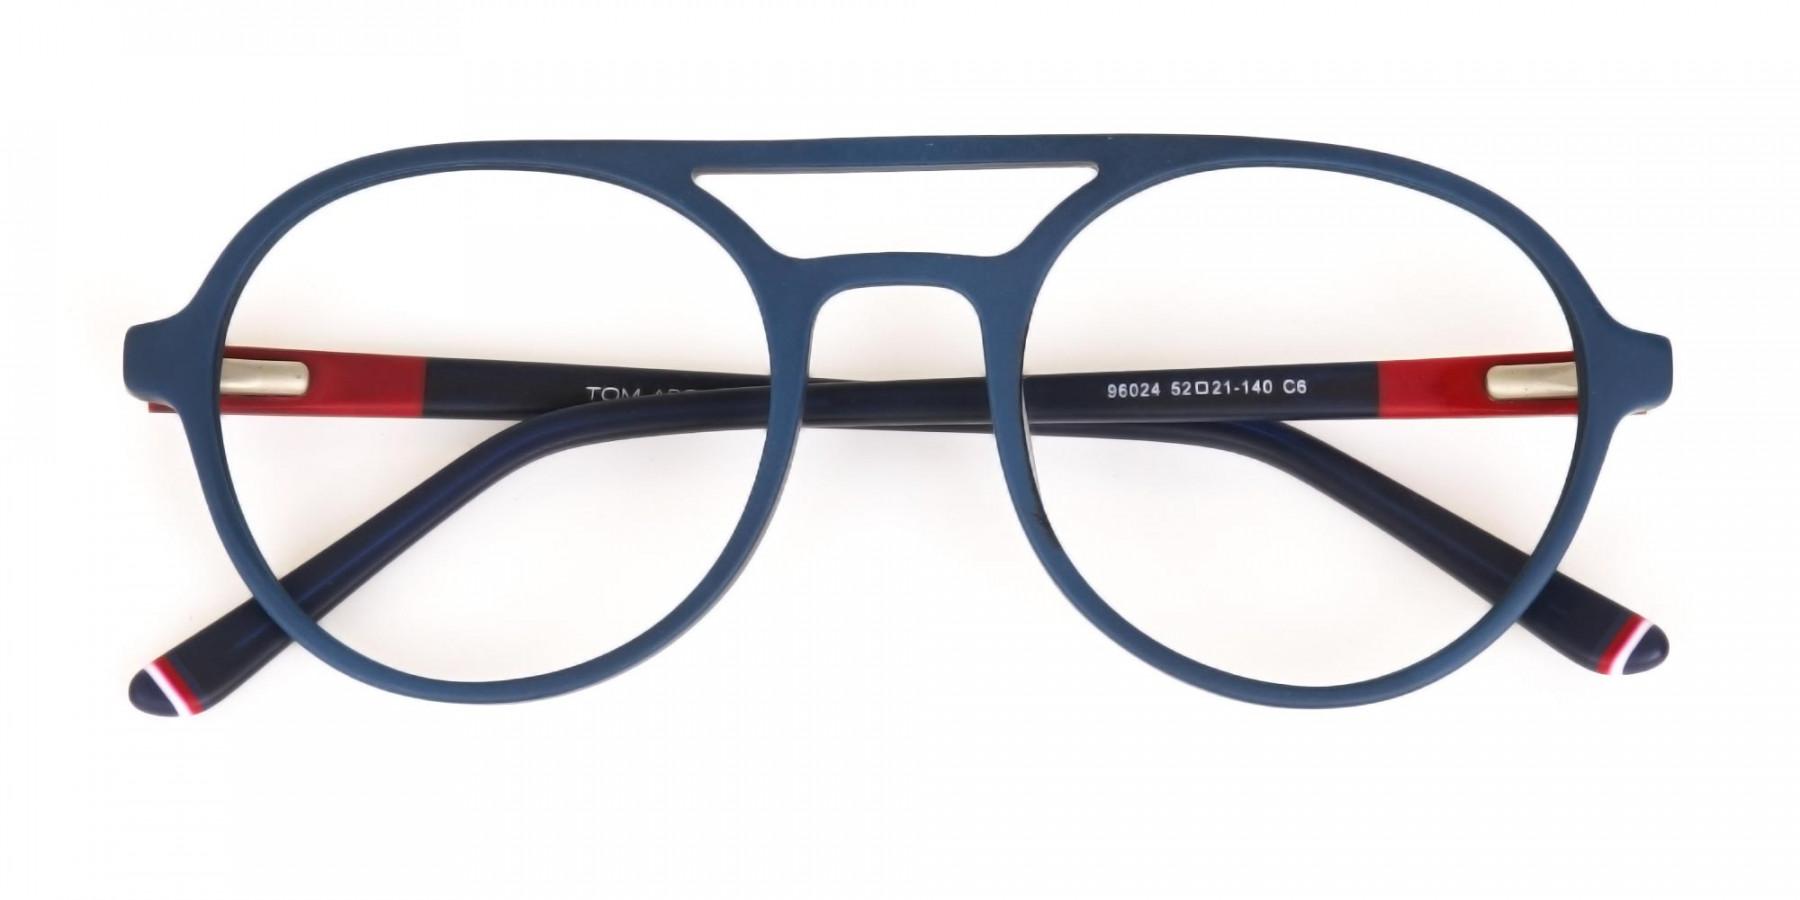 Turquoise Green & Dark Blue Double bridge Glasses -1